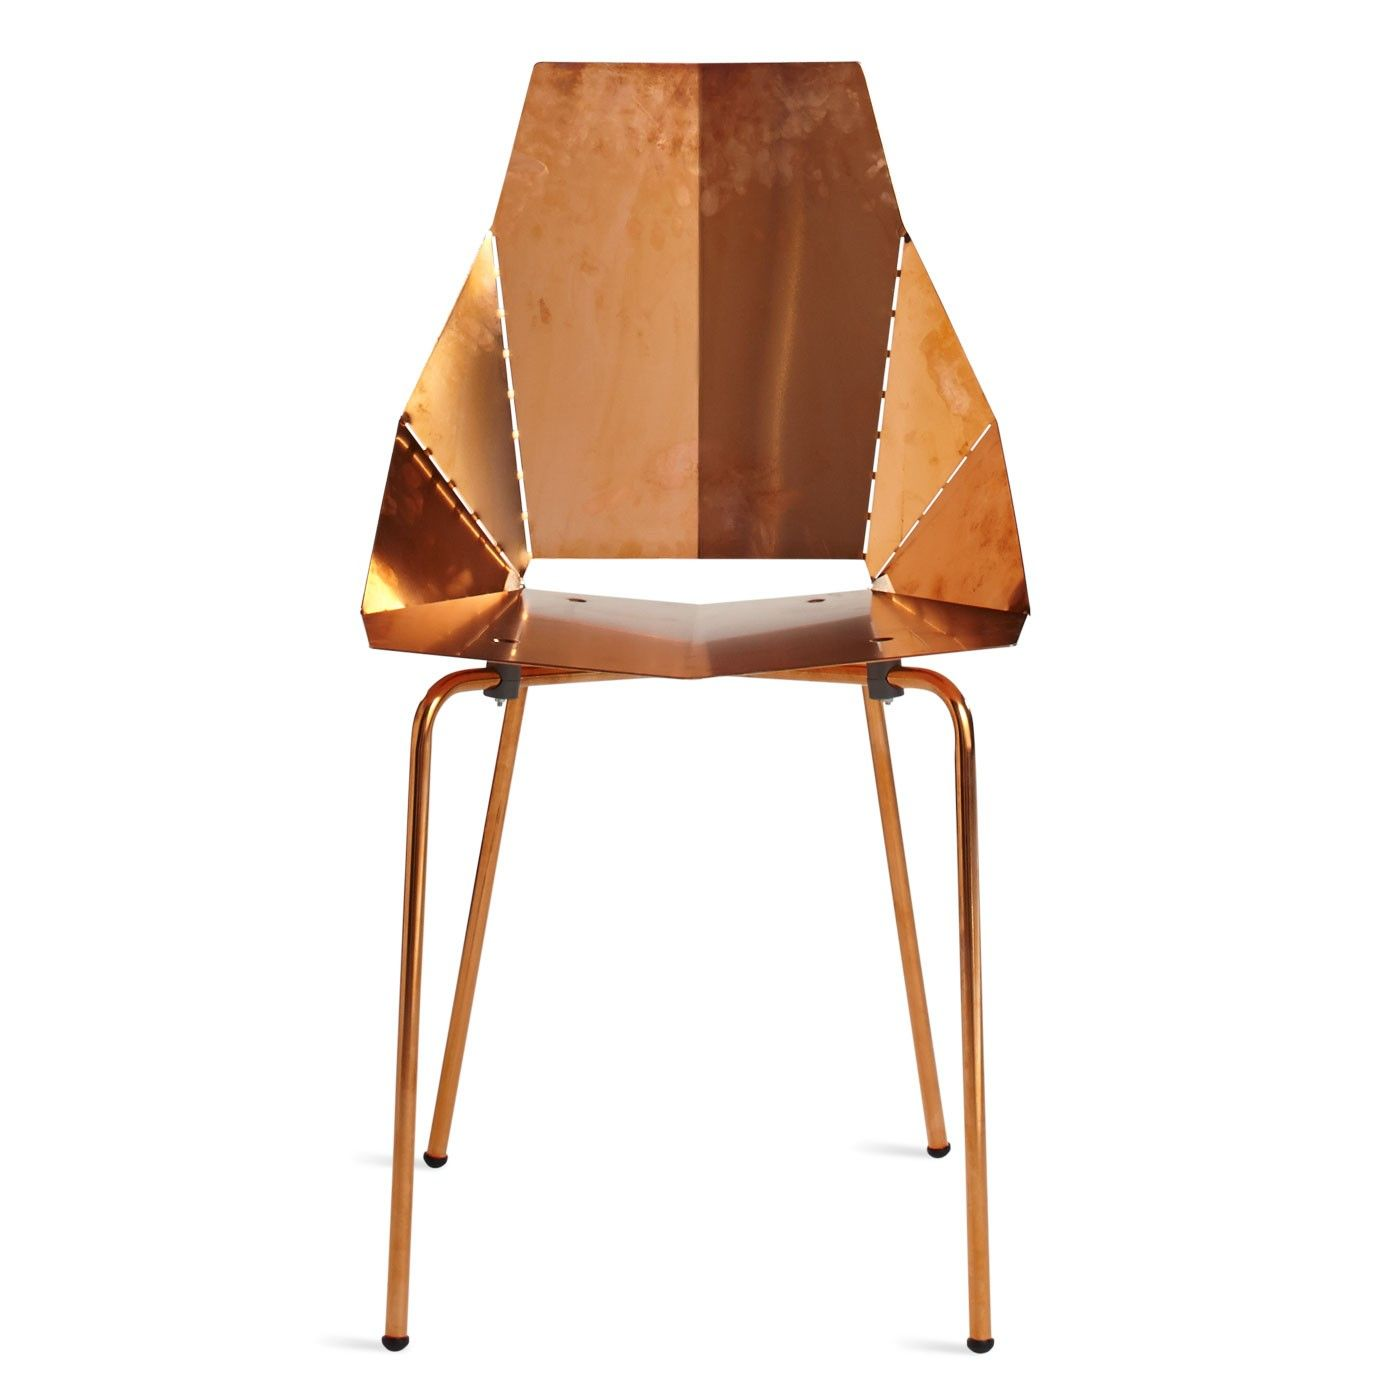 Copper Real Good Chair – Modern Designer Chairs Blu Dot